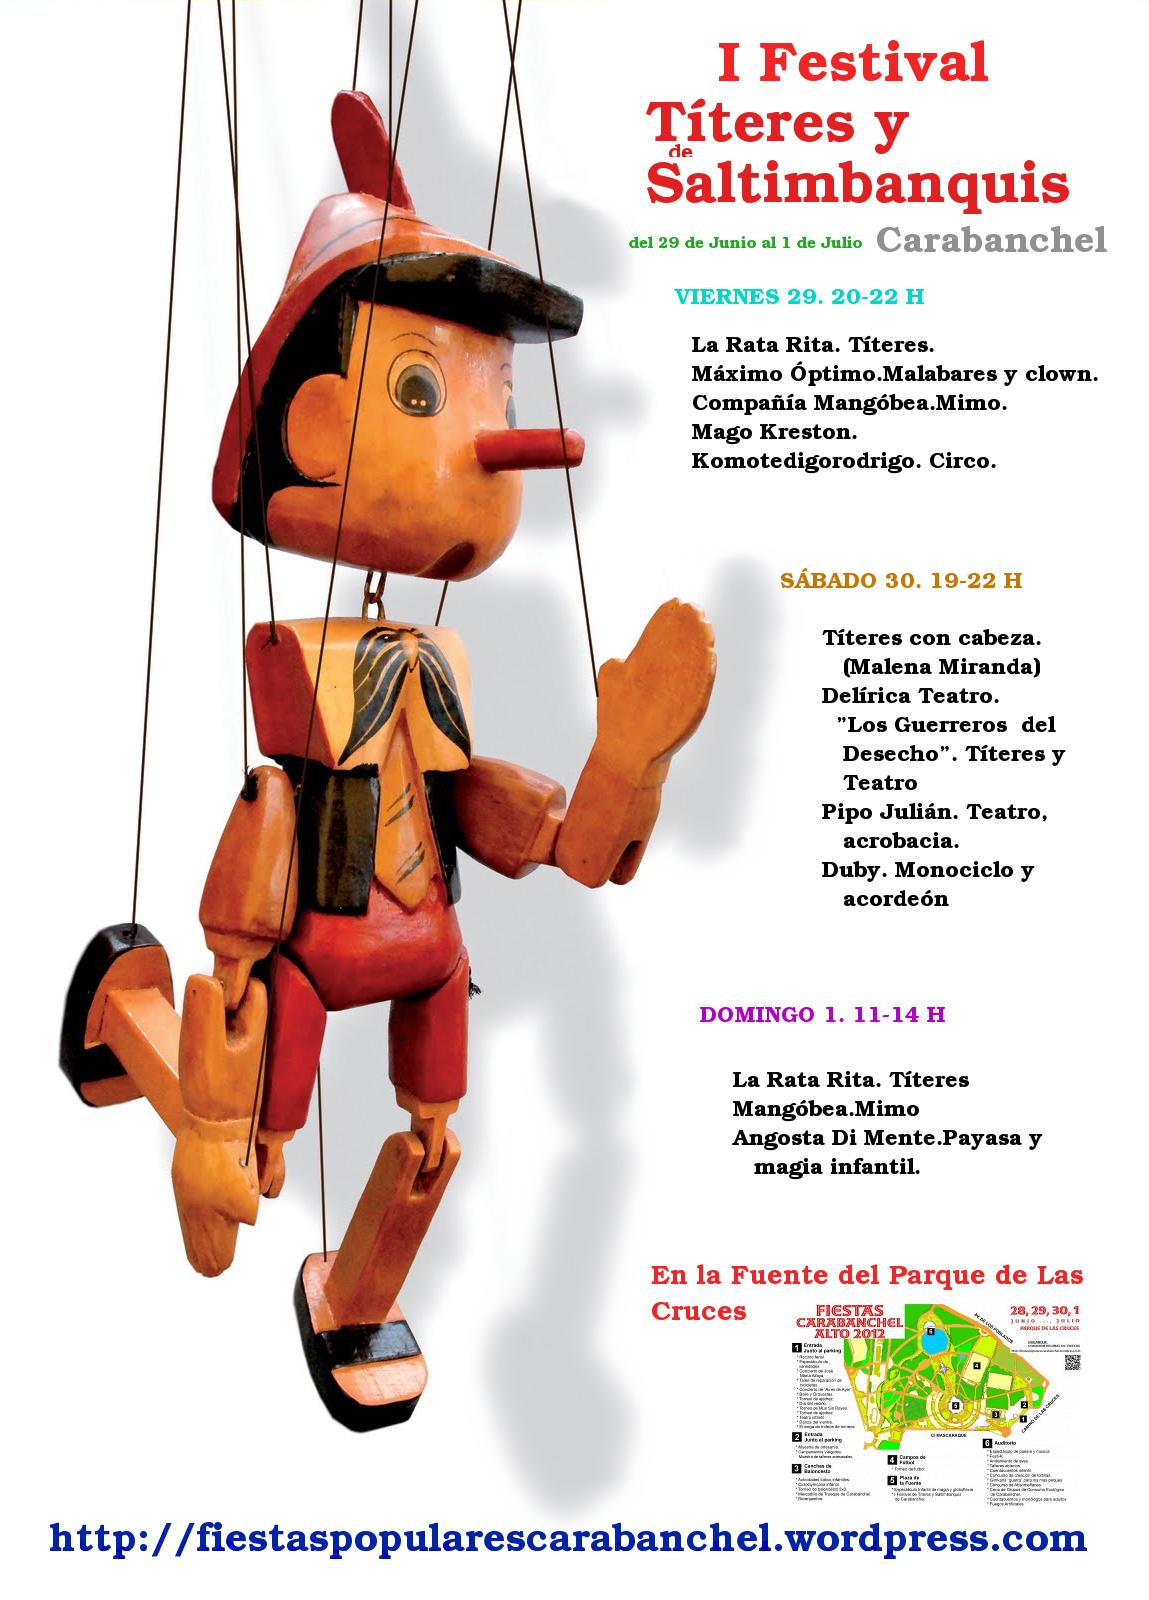 Festival de Titeres Carabanchel